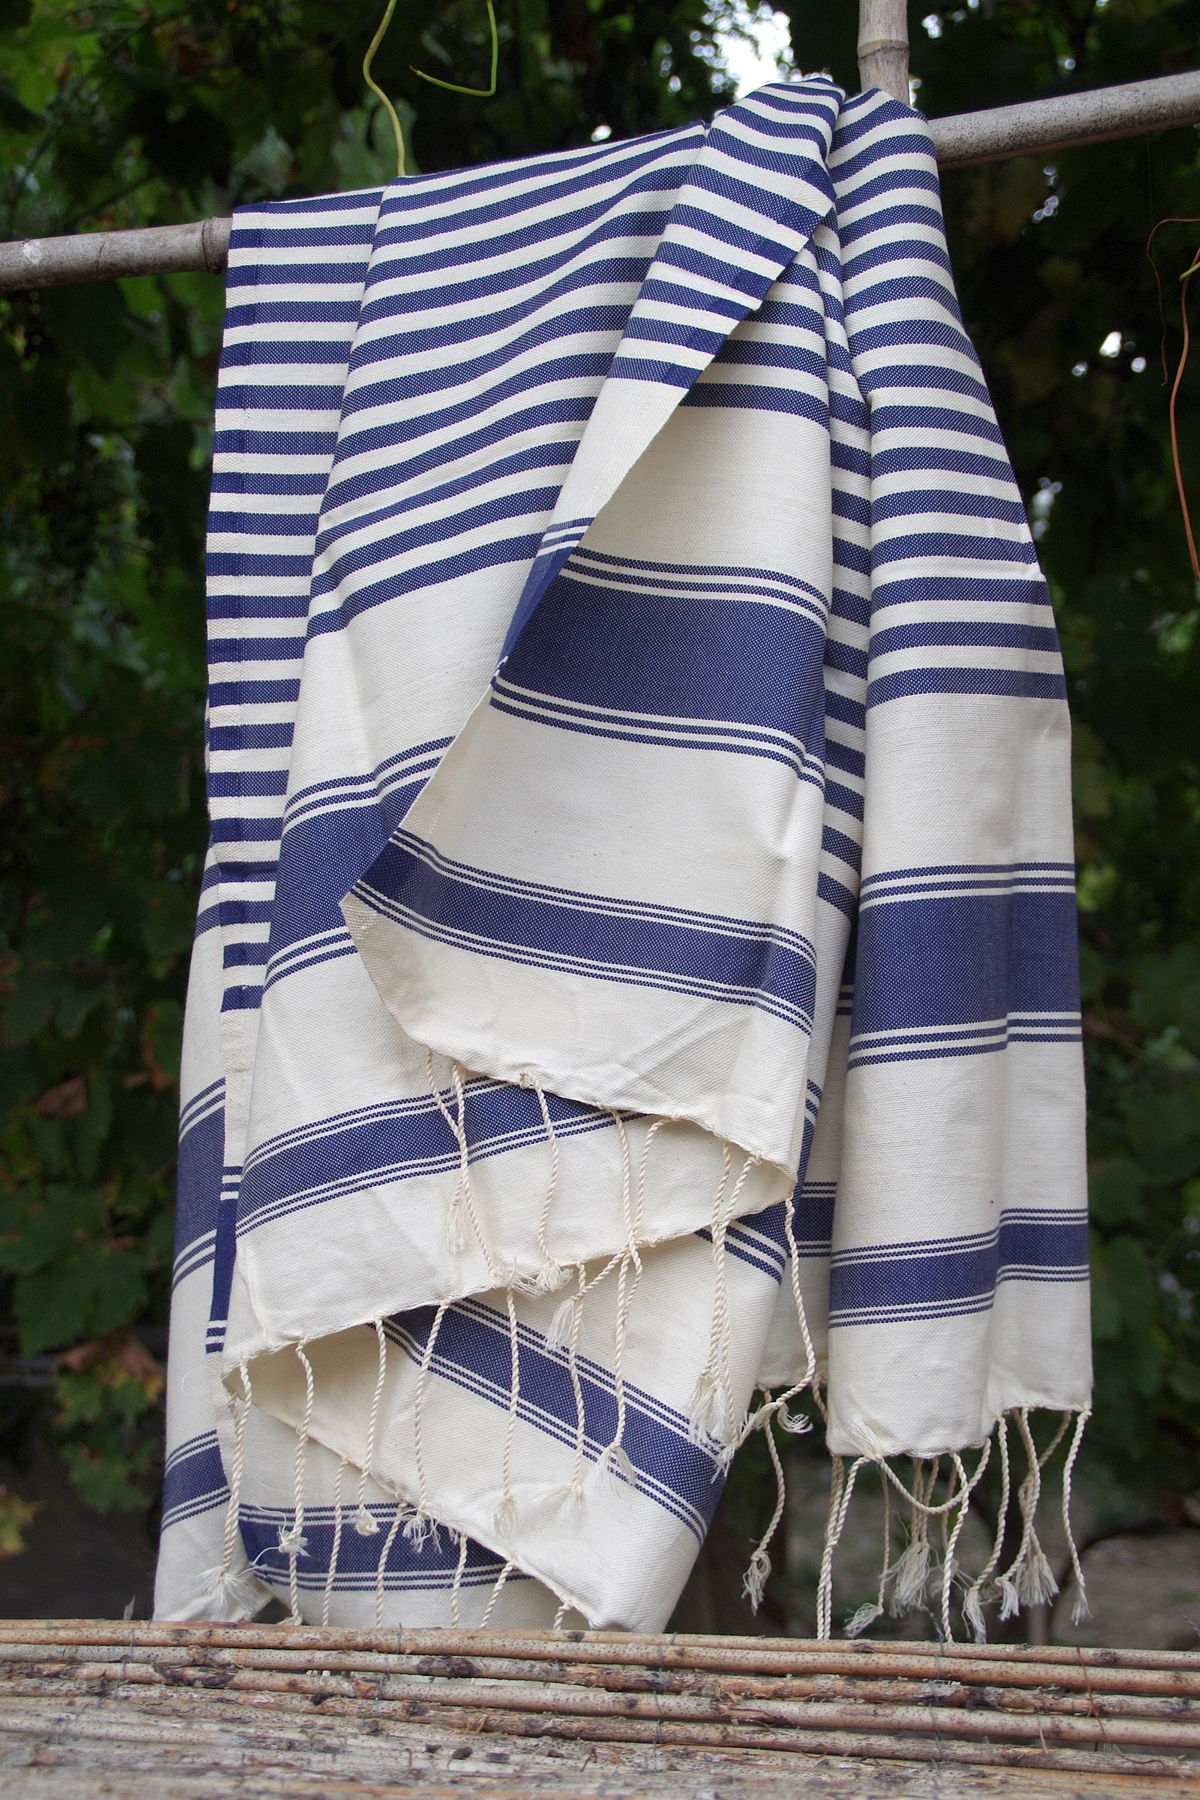 Fouta towel - Wikipedia